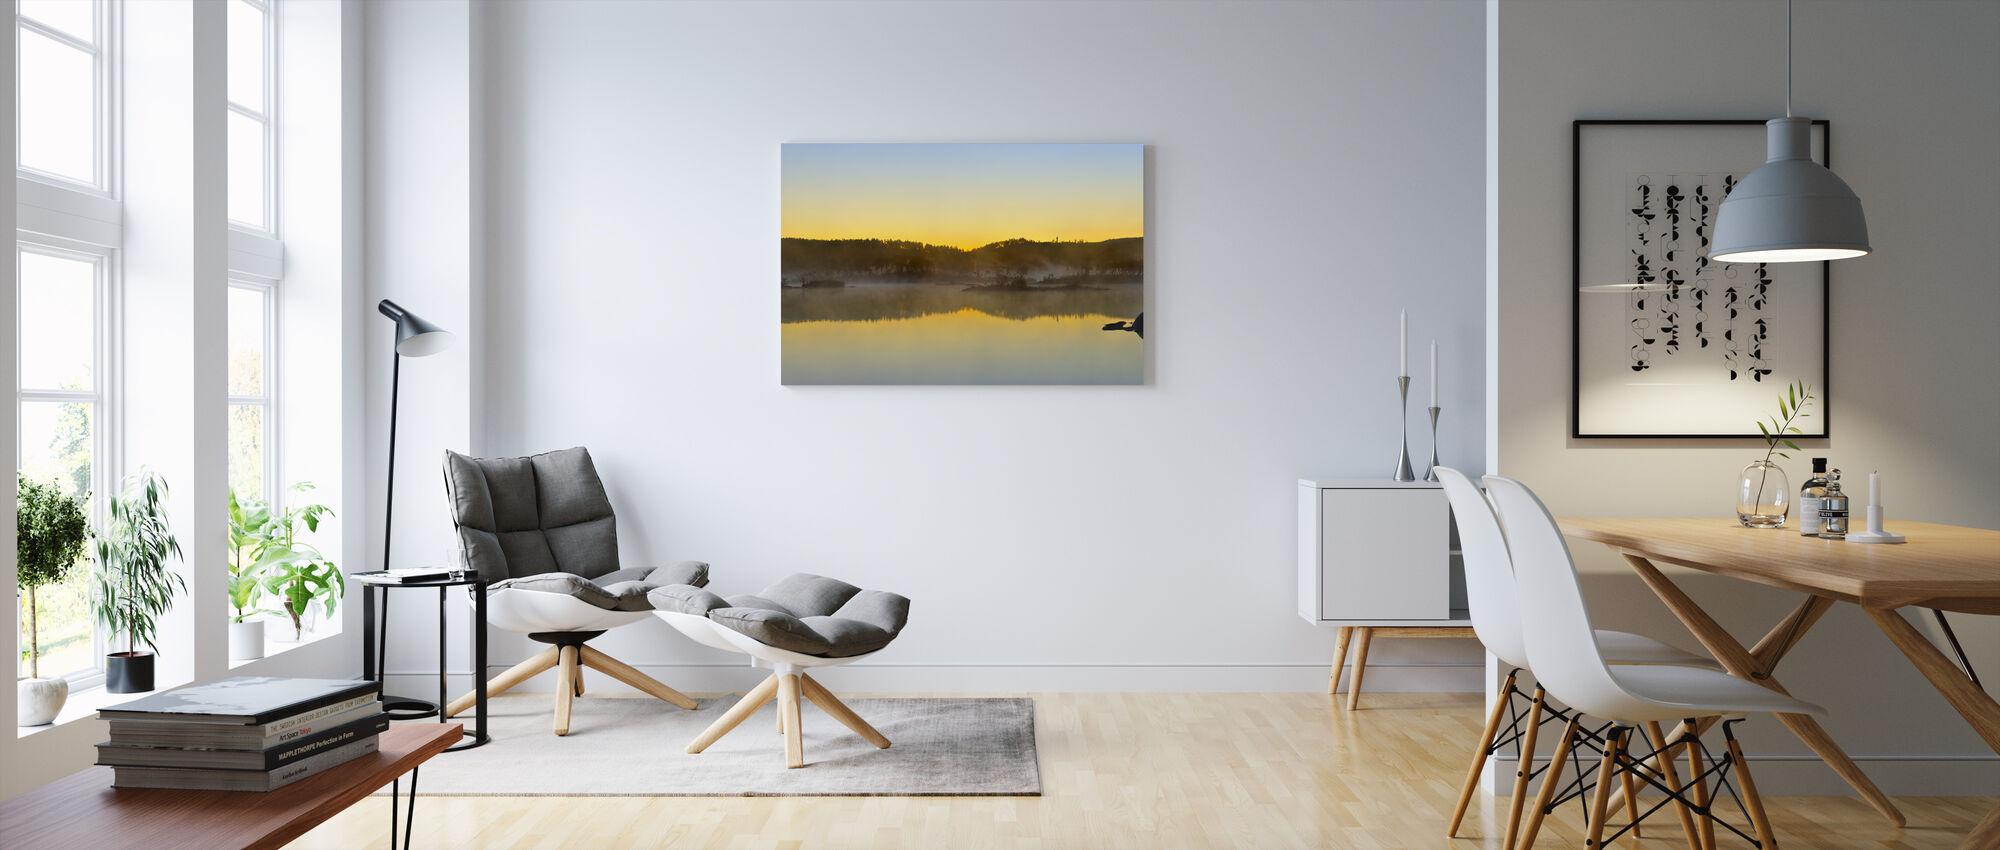 Yellow Dusk, Senja Norway - Canvas print - Living Room